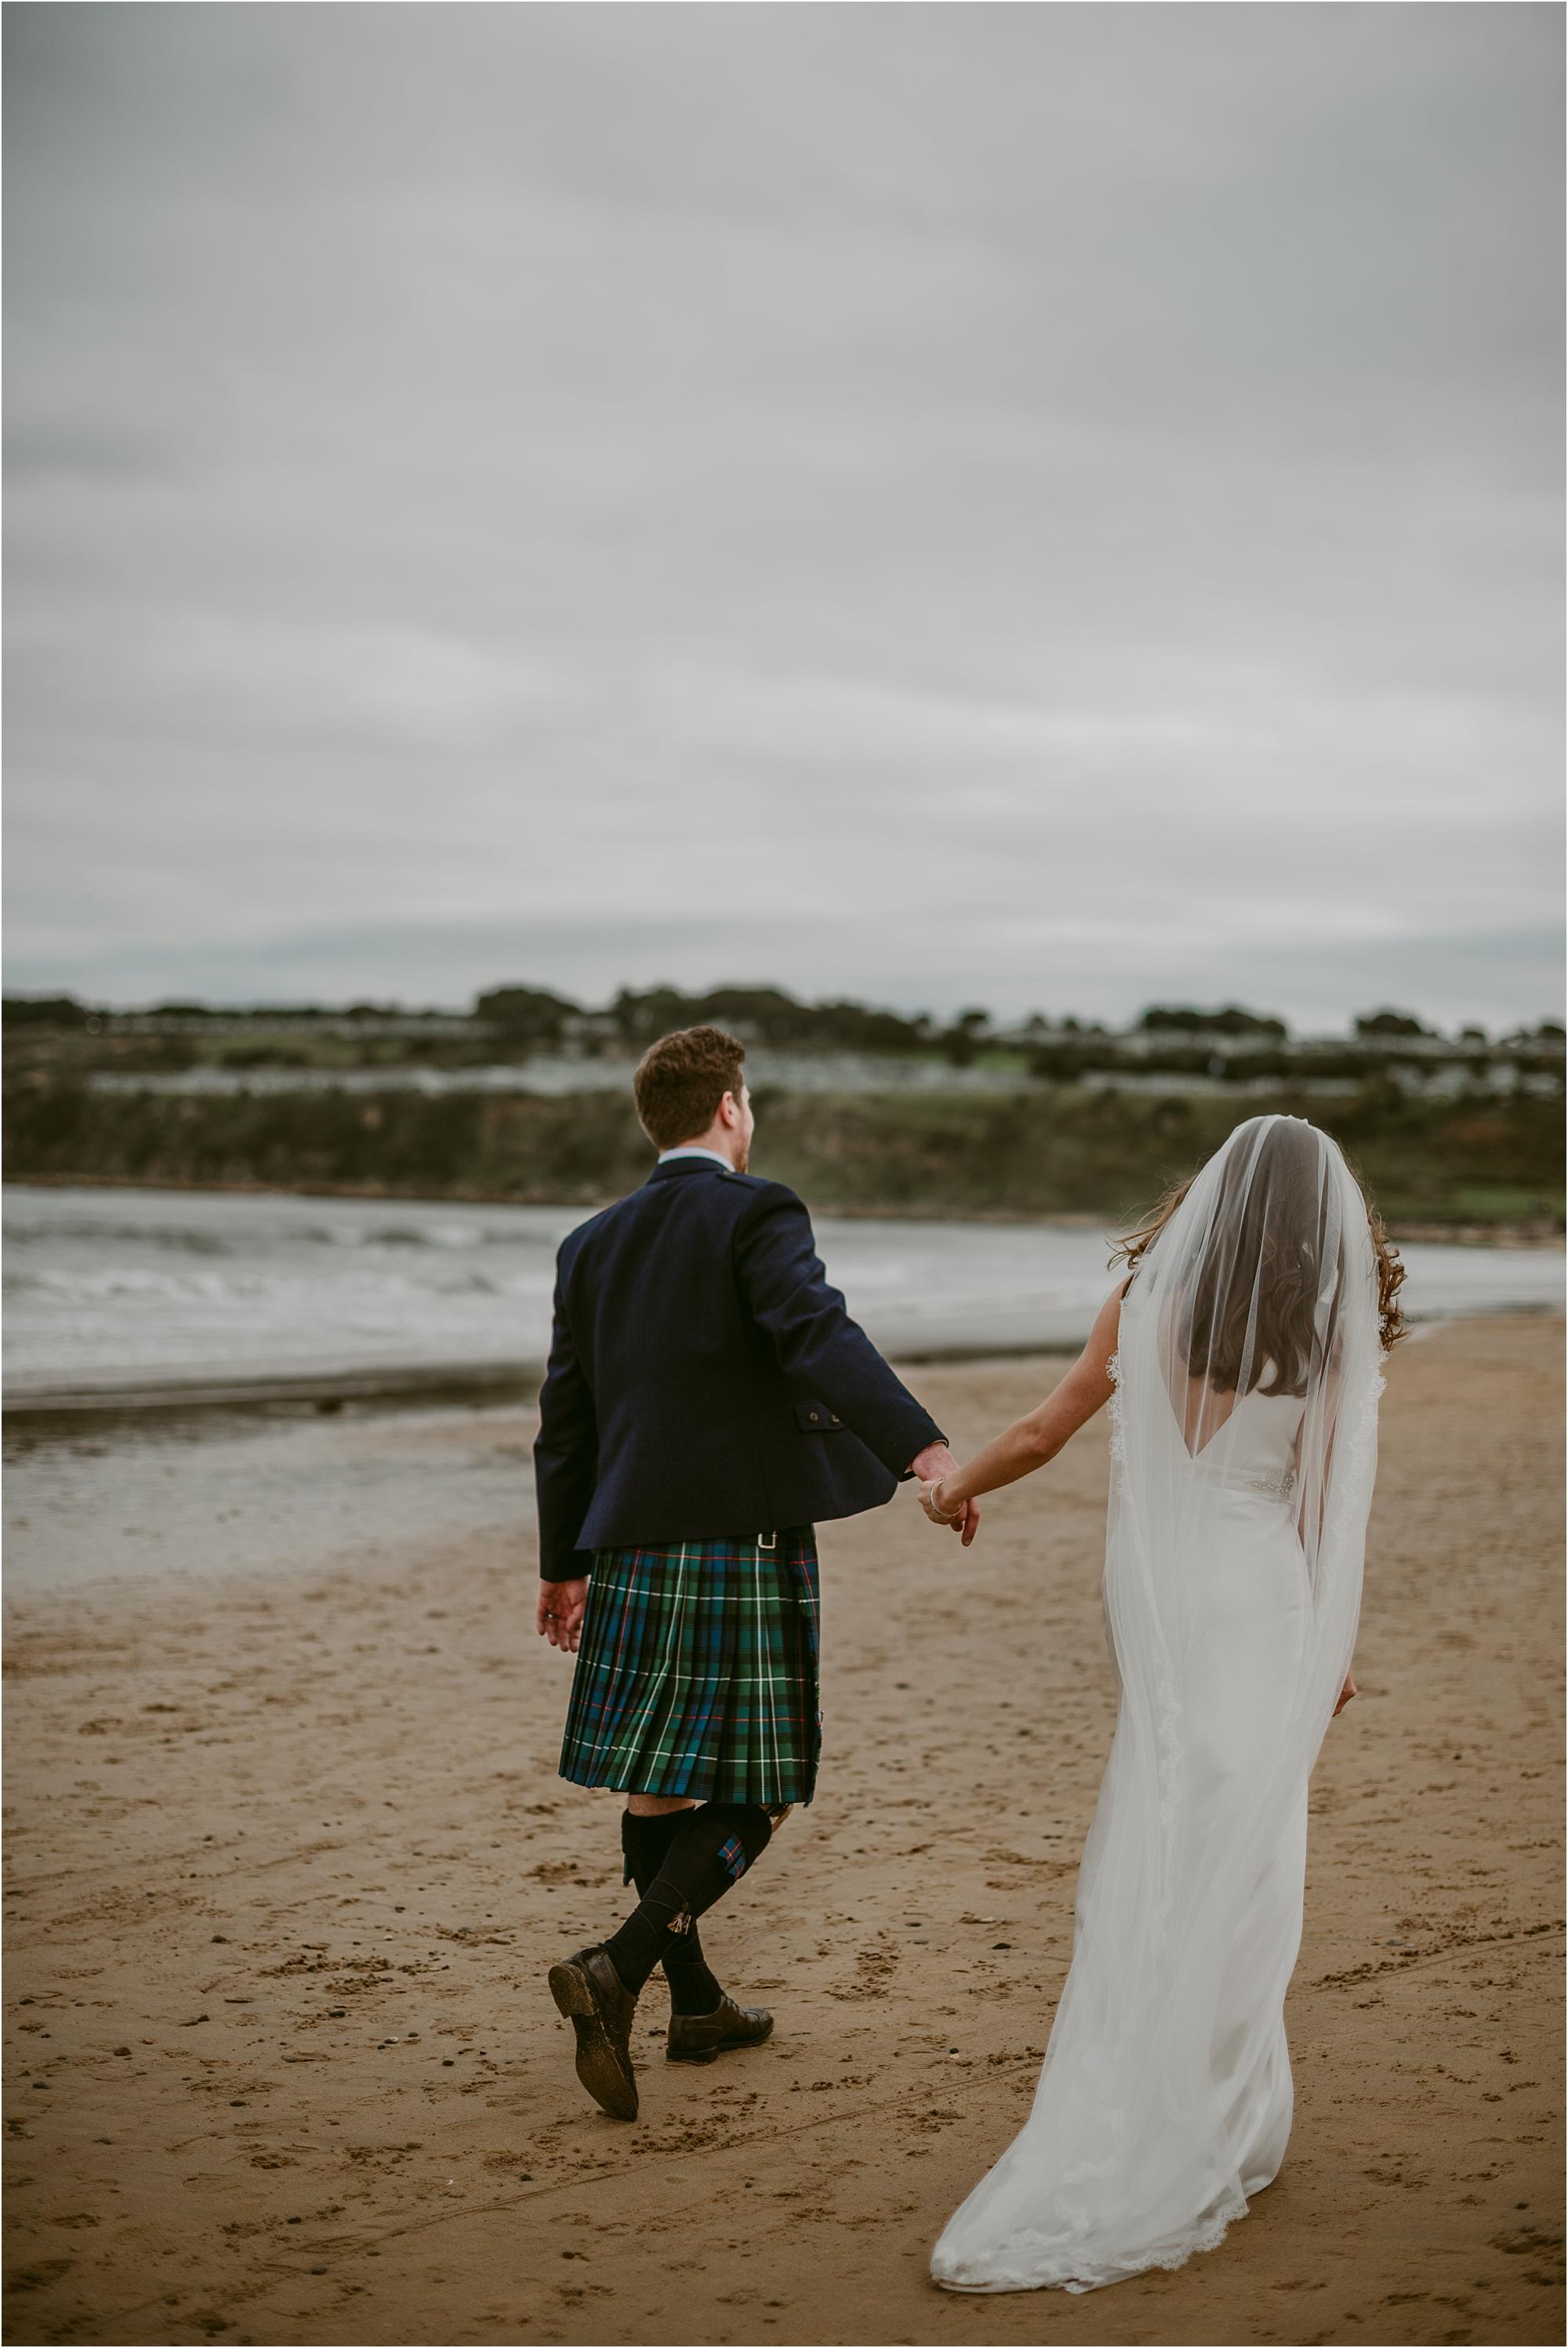 Scott+Joanna-Kinkell-Byre-wedding-fife-photography__0052.jpg